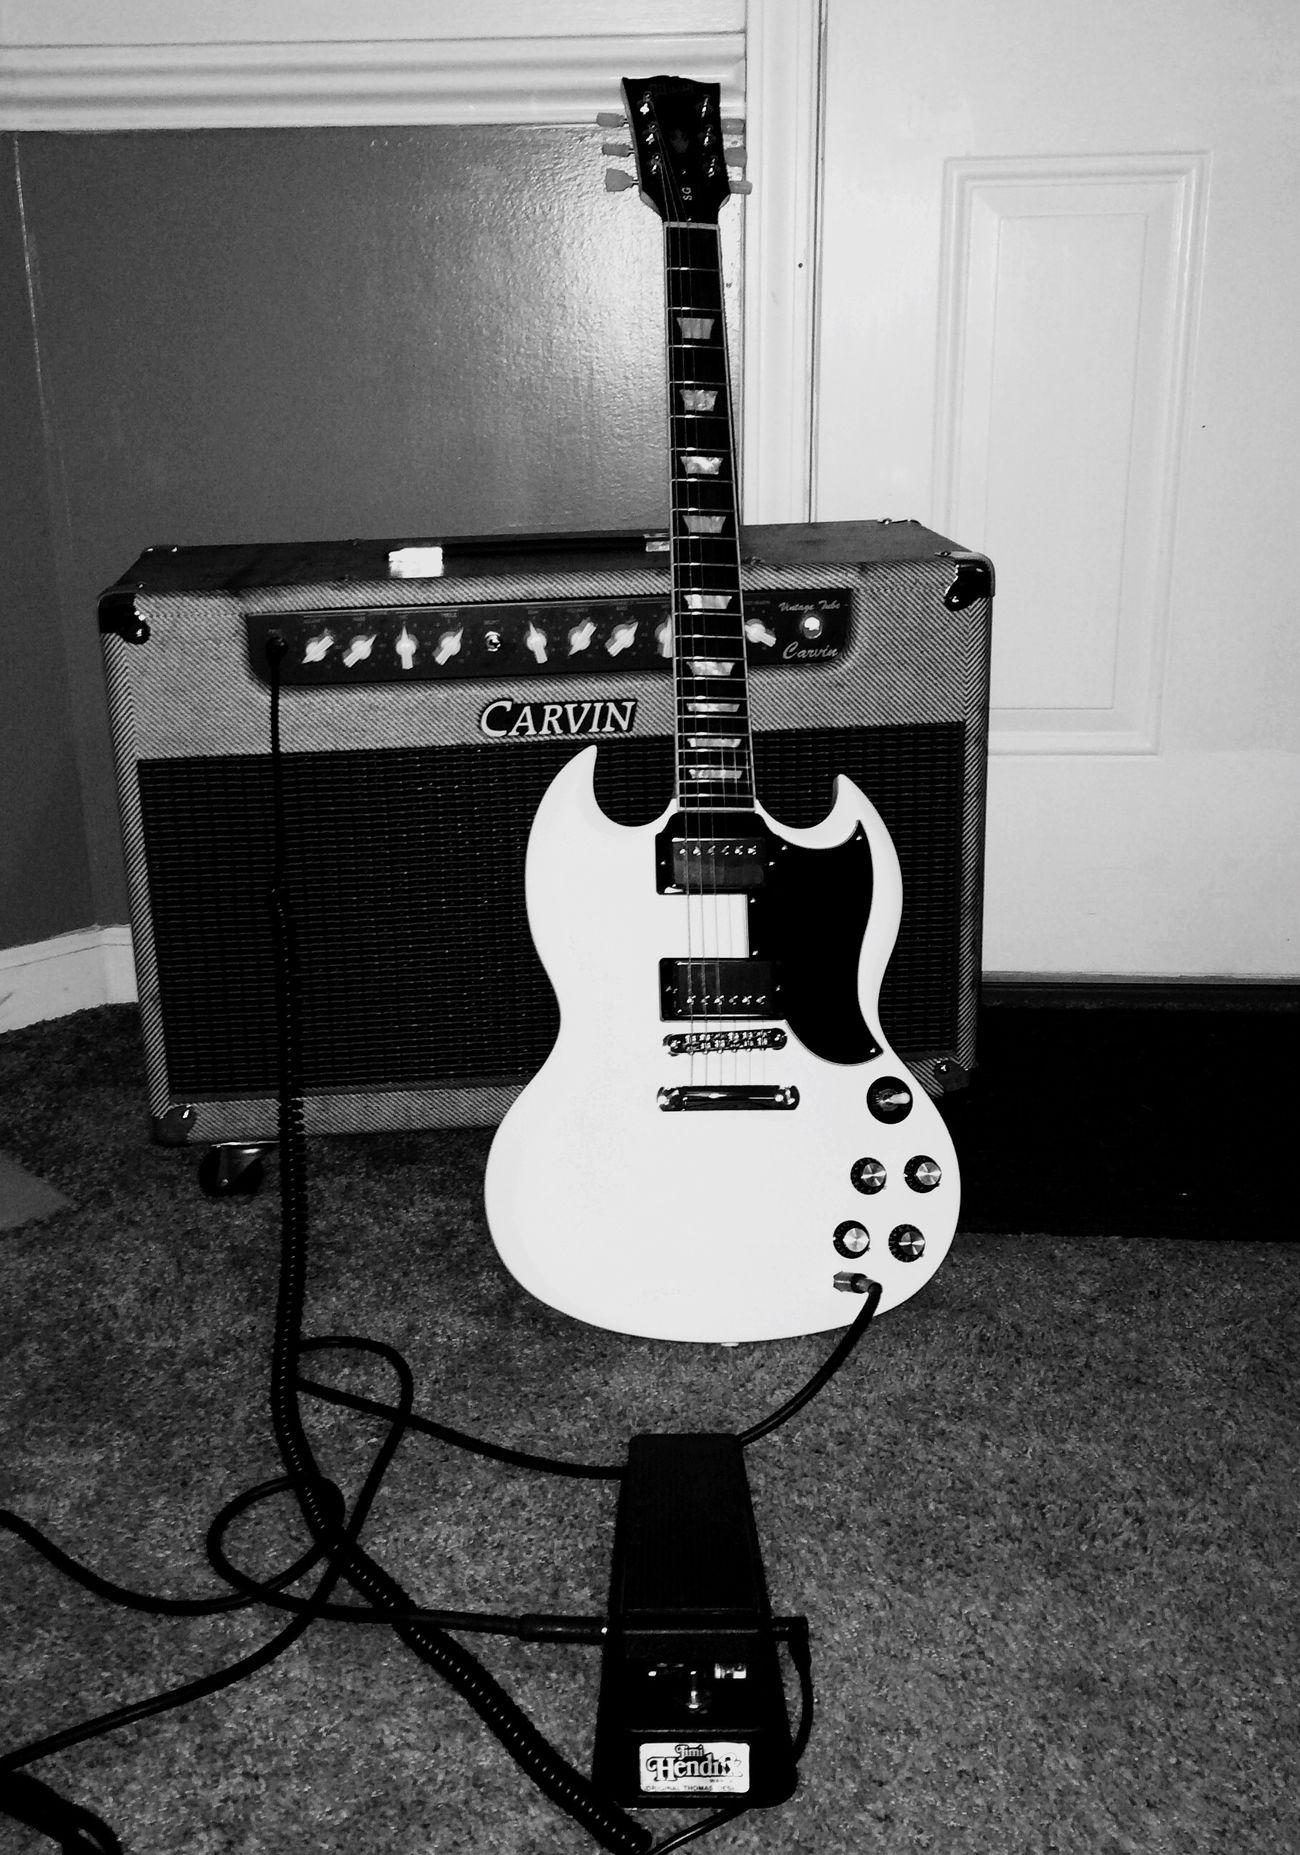 Rock'n'Roll Carvin Gibson SG Jimmy Hendrix Wah Vintage Music Musician